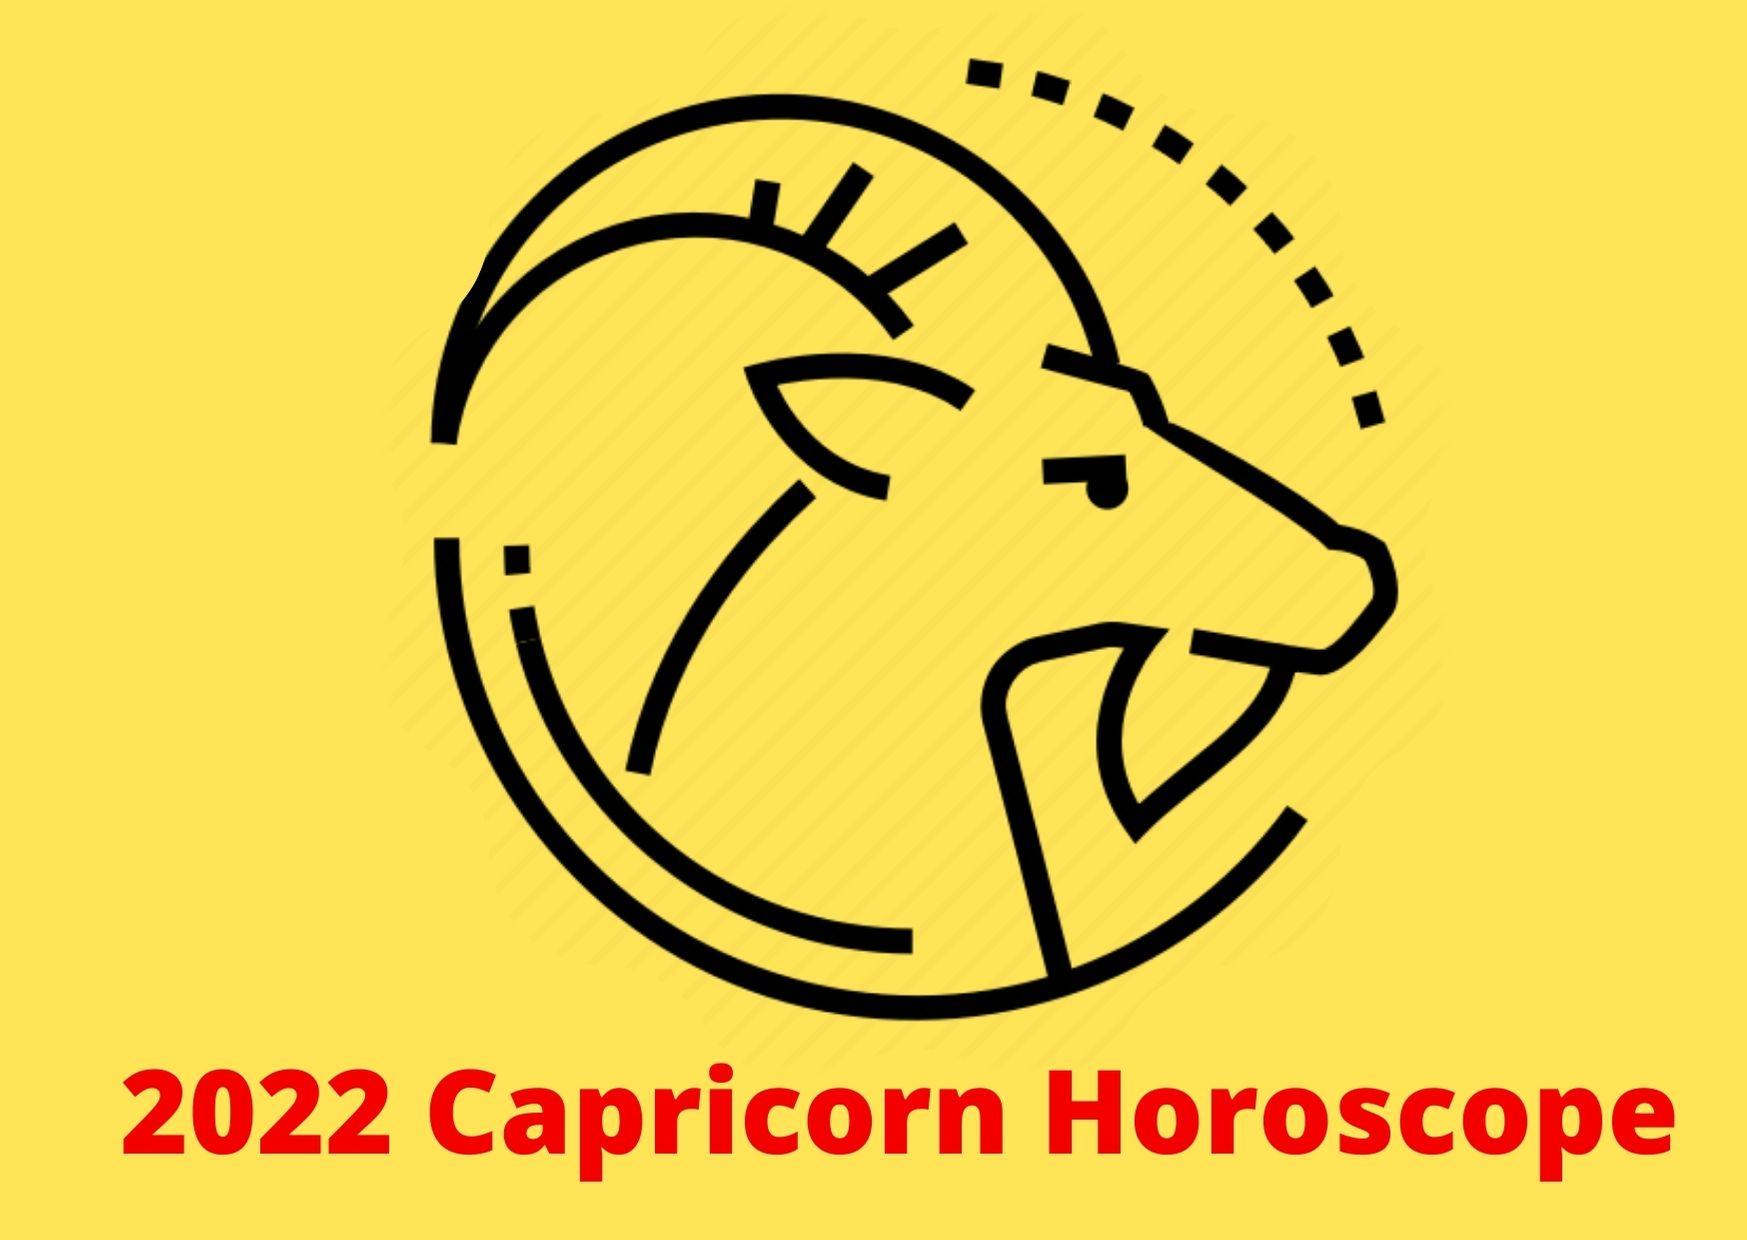 2022 Capricorn Horoscope Yearly Predictions